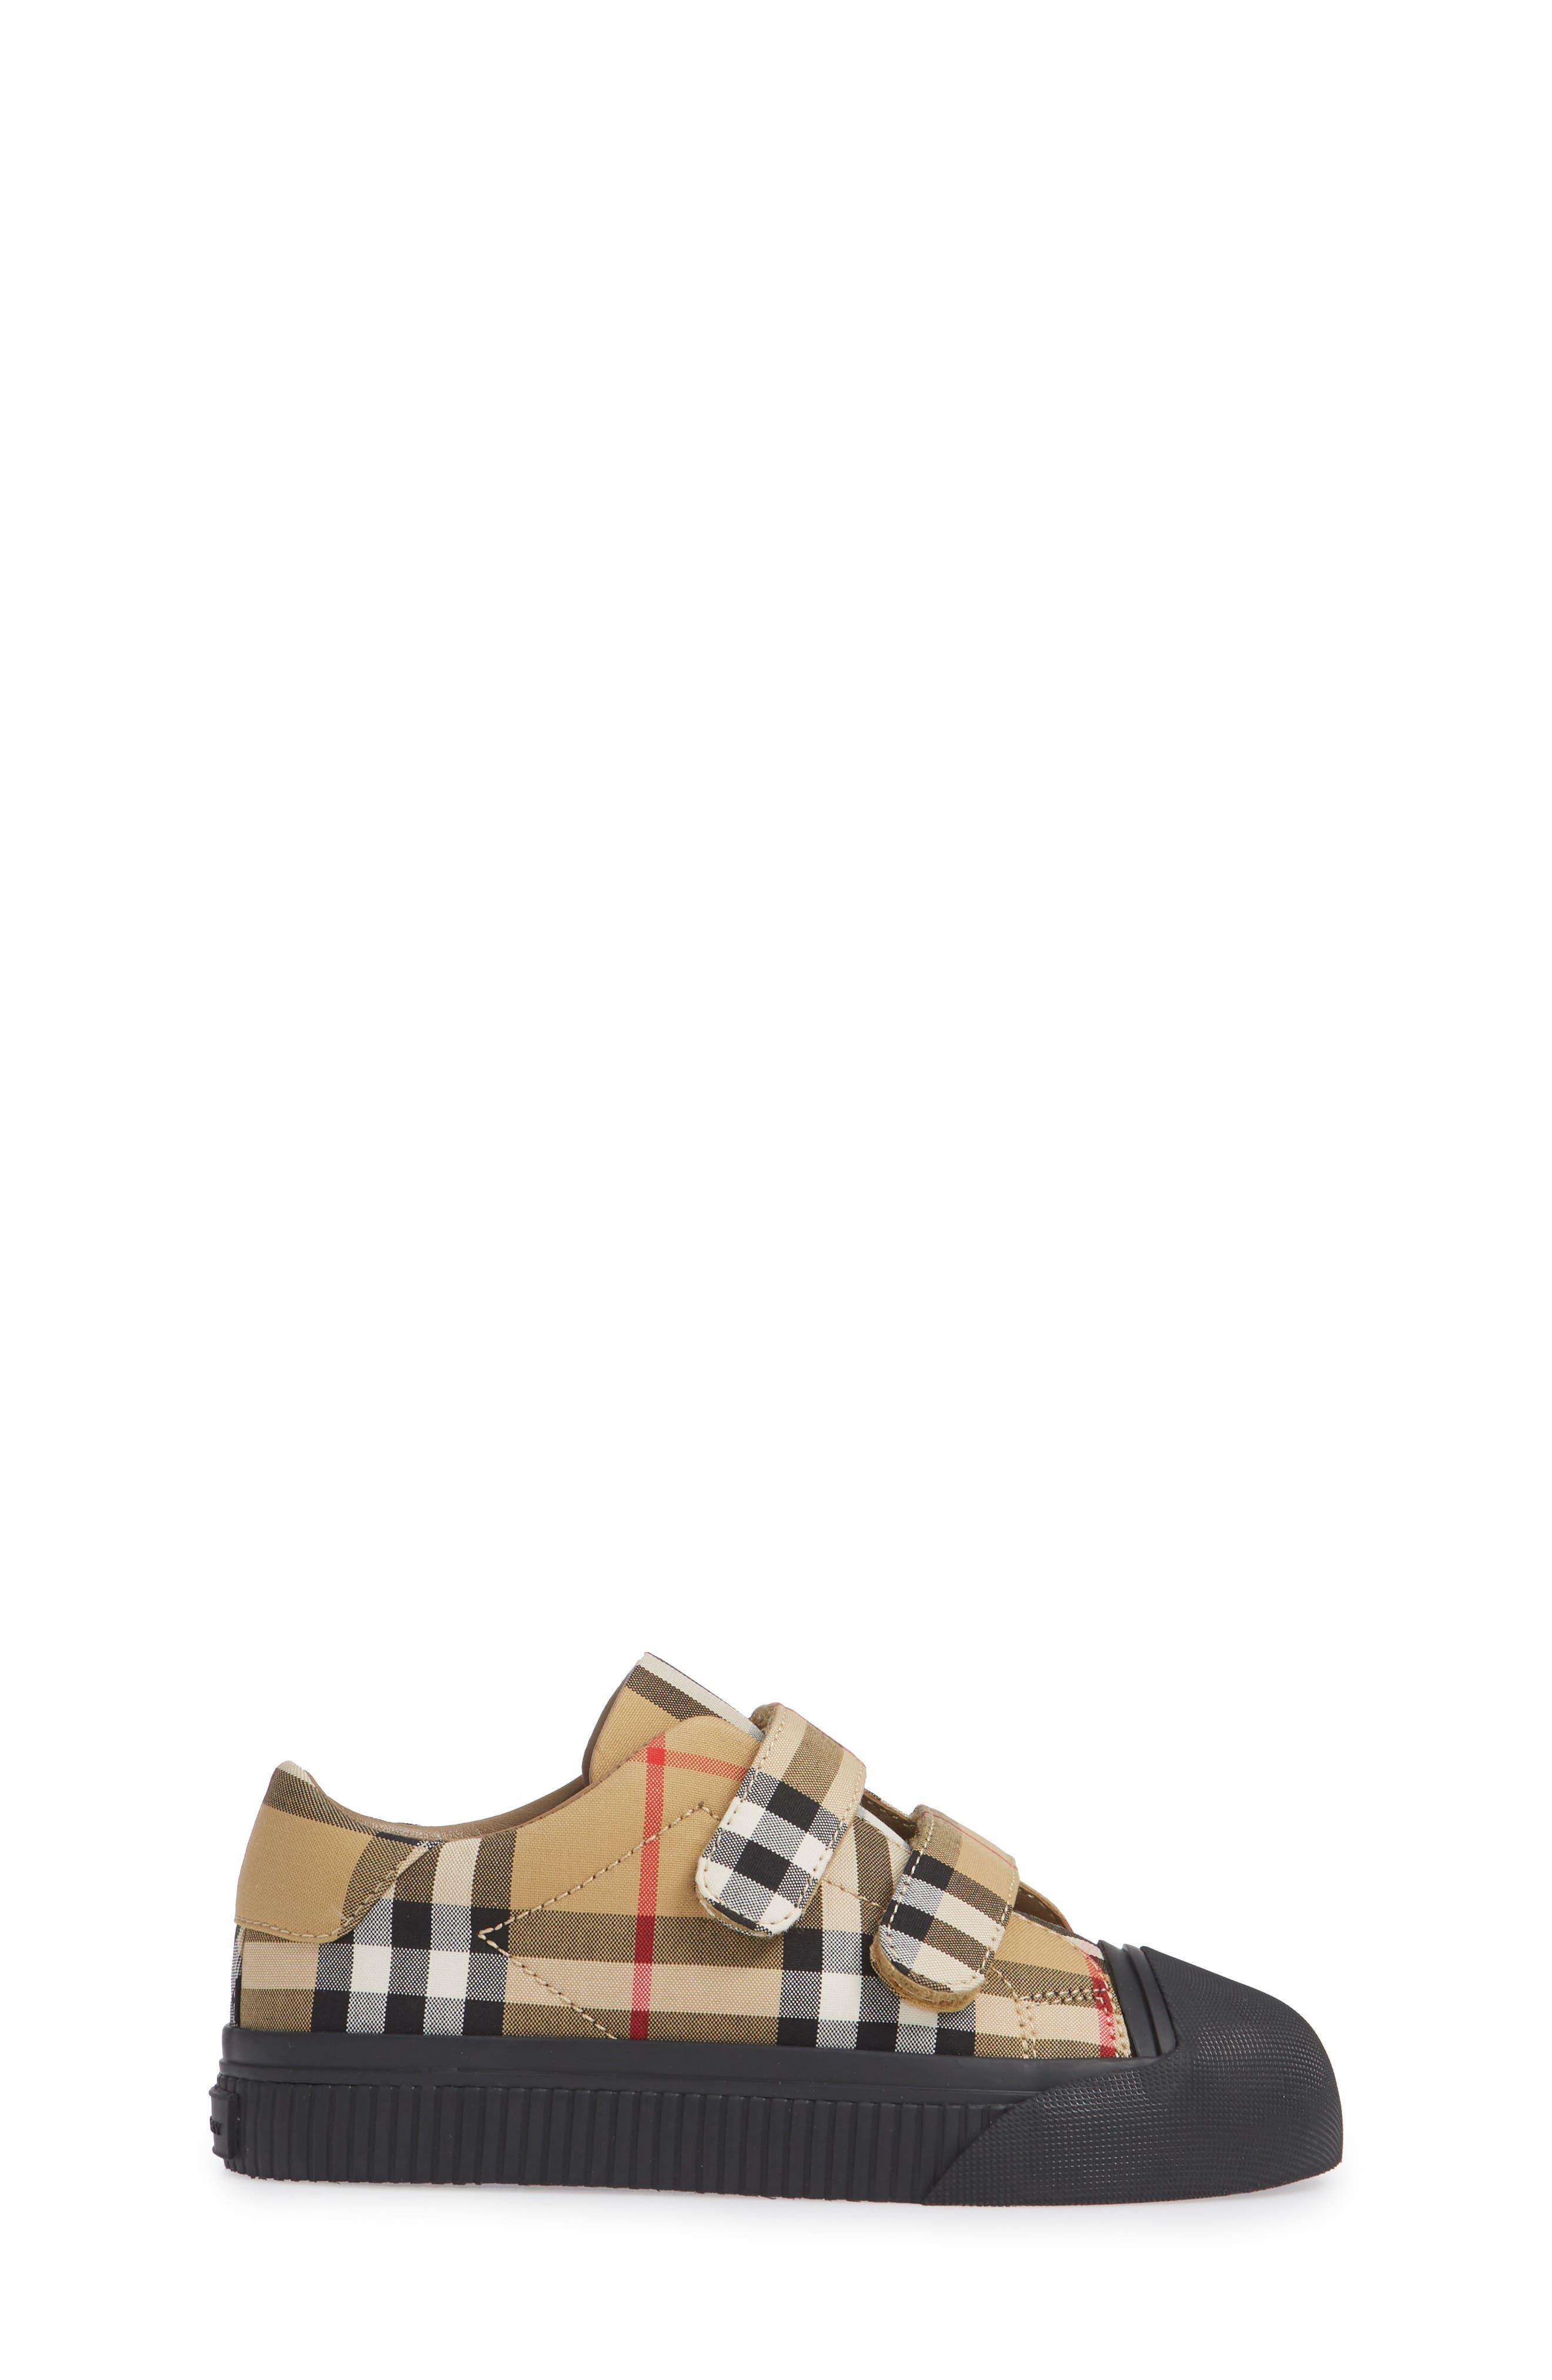 Belside Sneaker,                             Alternate thumbnail 3, color,                             ANTIQUE YELLOW/ BLACK